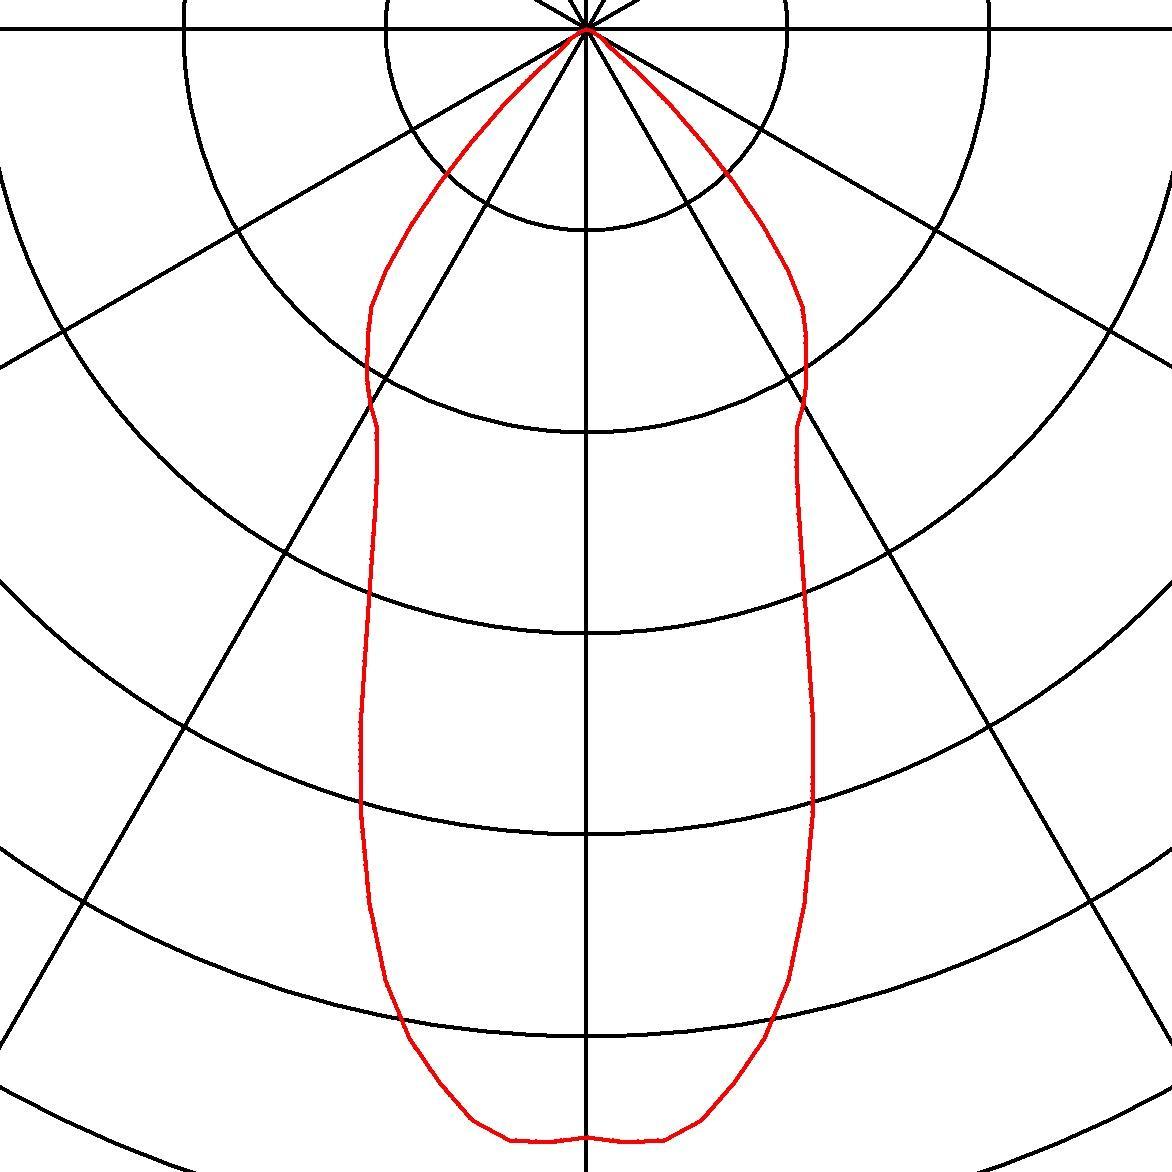 Lichtdistributiecurve van TOTHEE LED wit/zwart 1xLED 3000K 50°